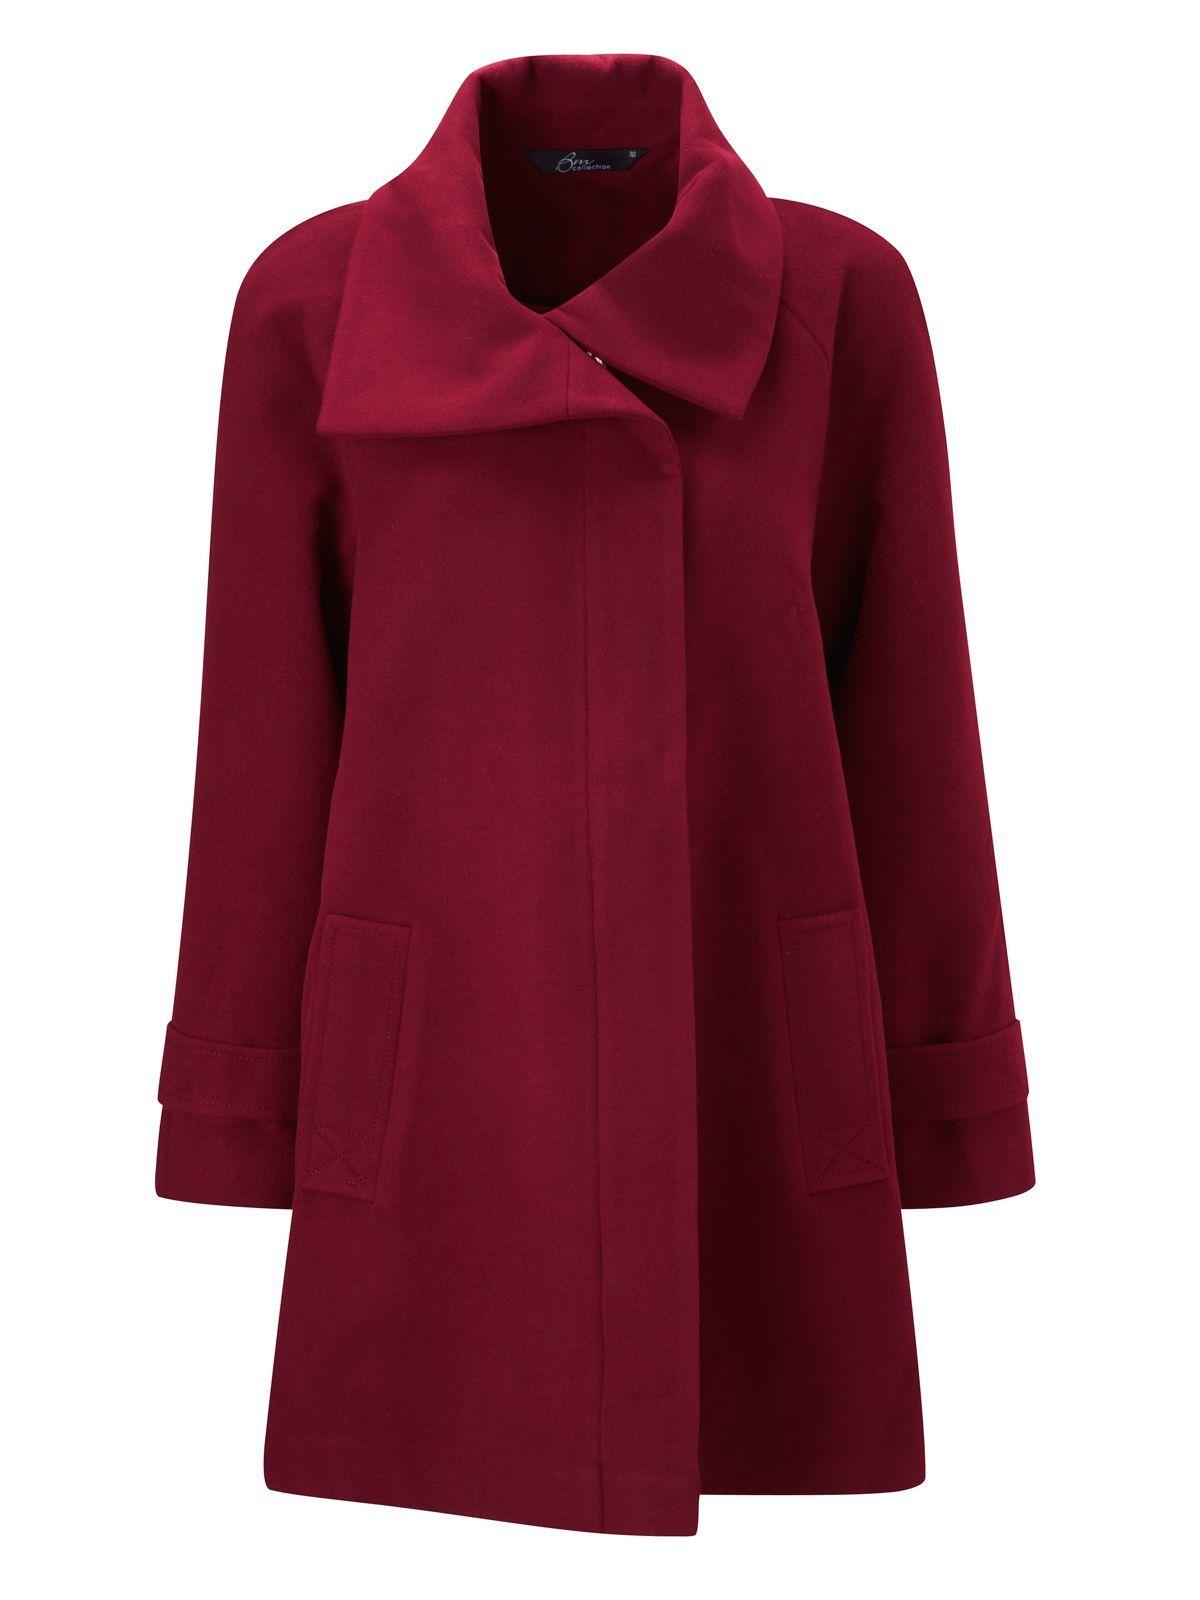 1f3d19d363b plus sized stylish coats